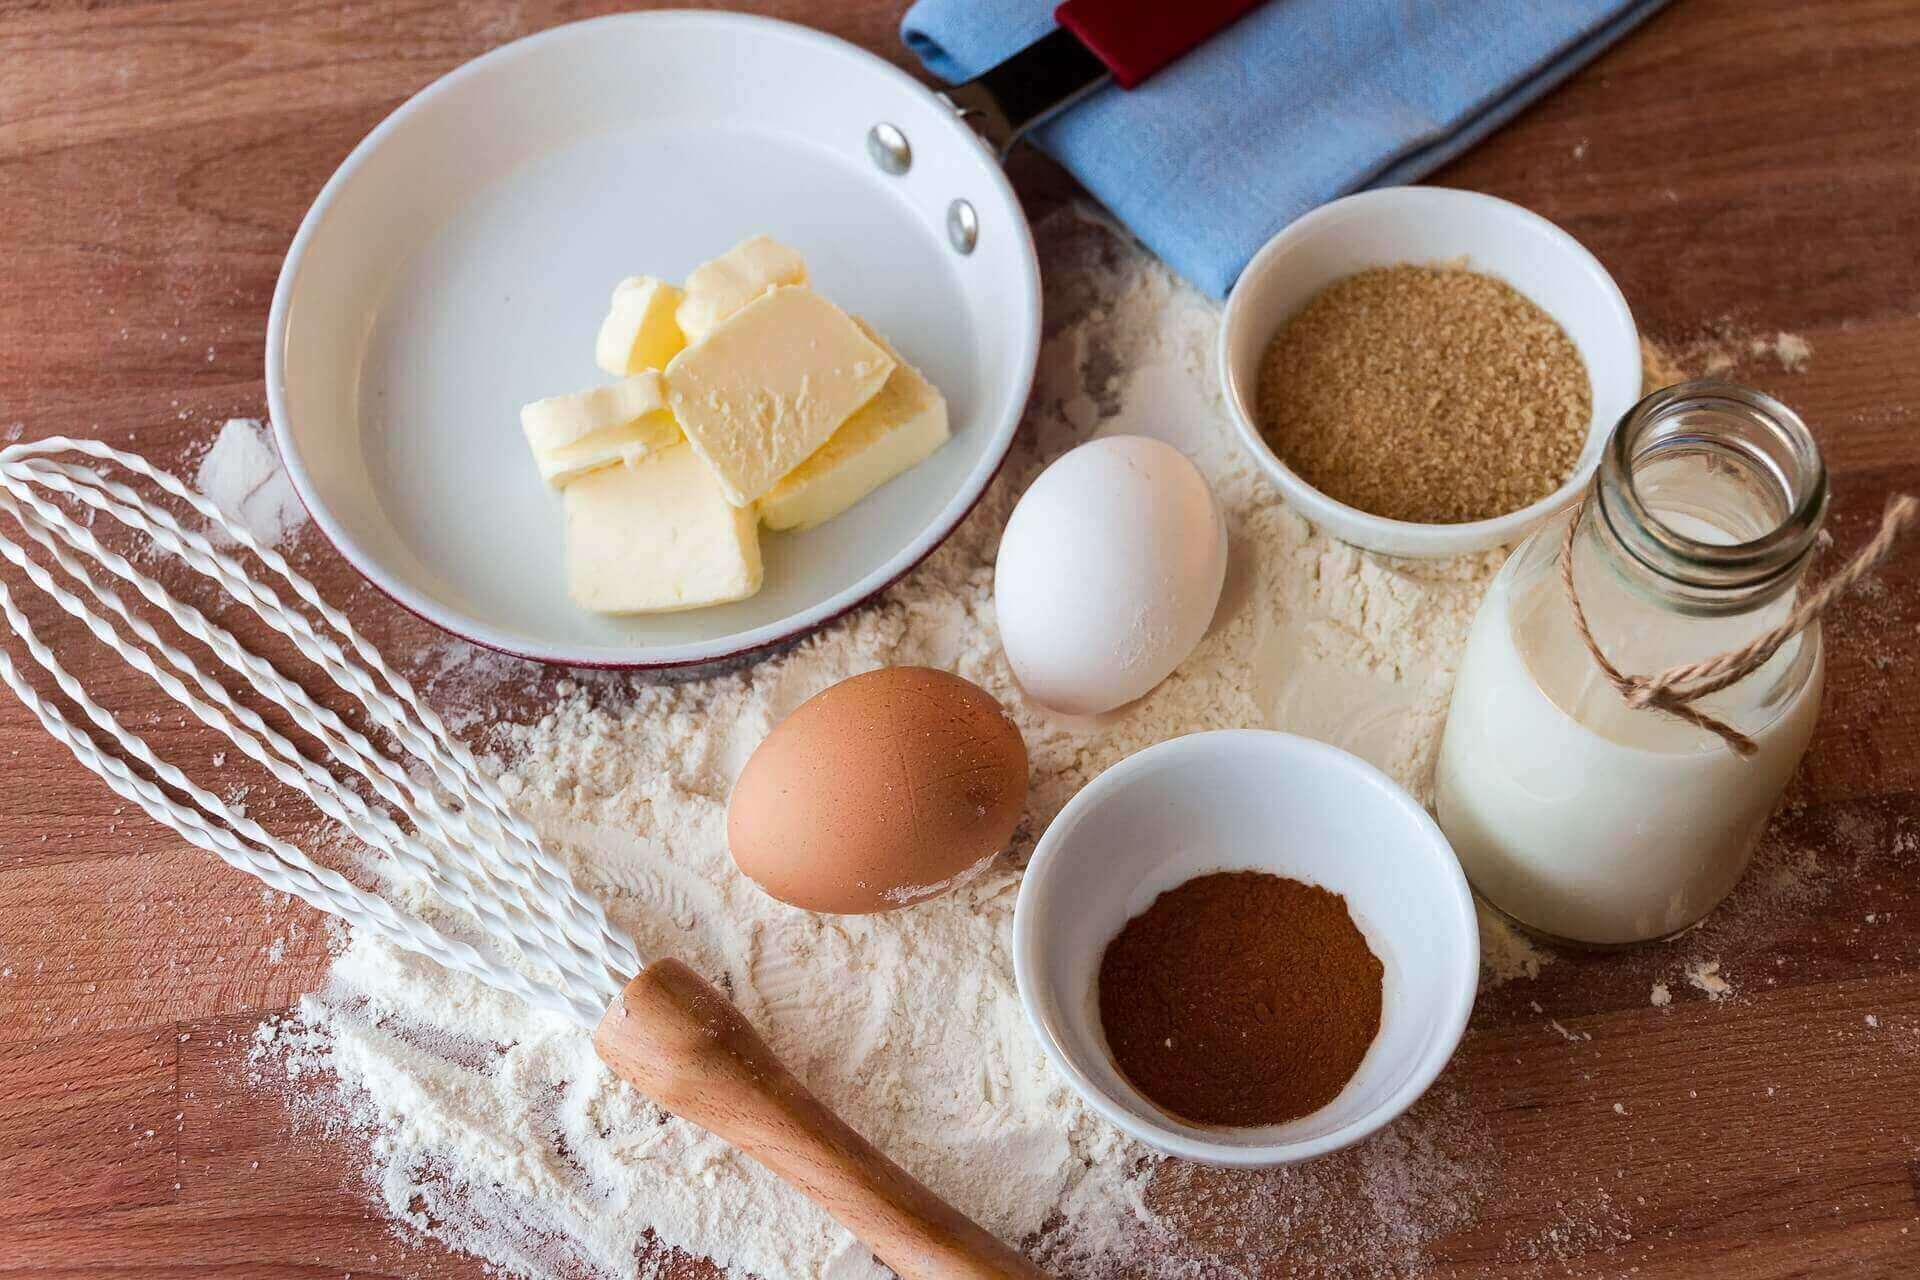 How to make best buttercream